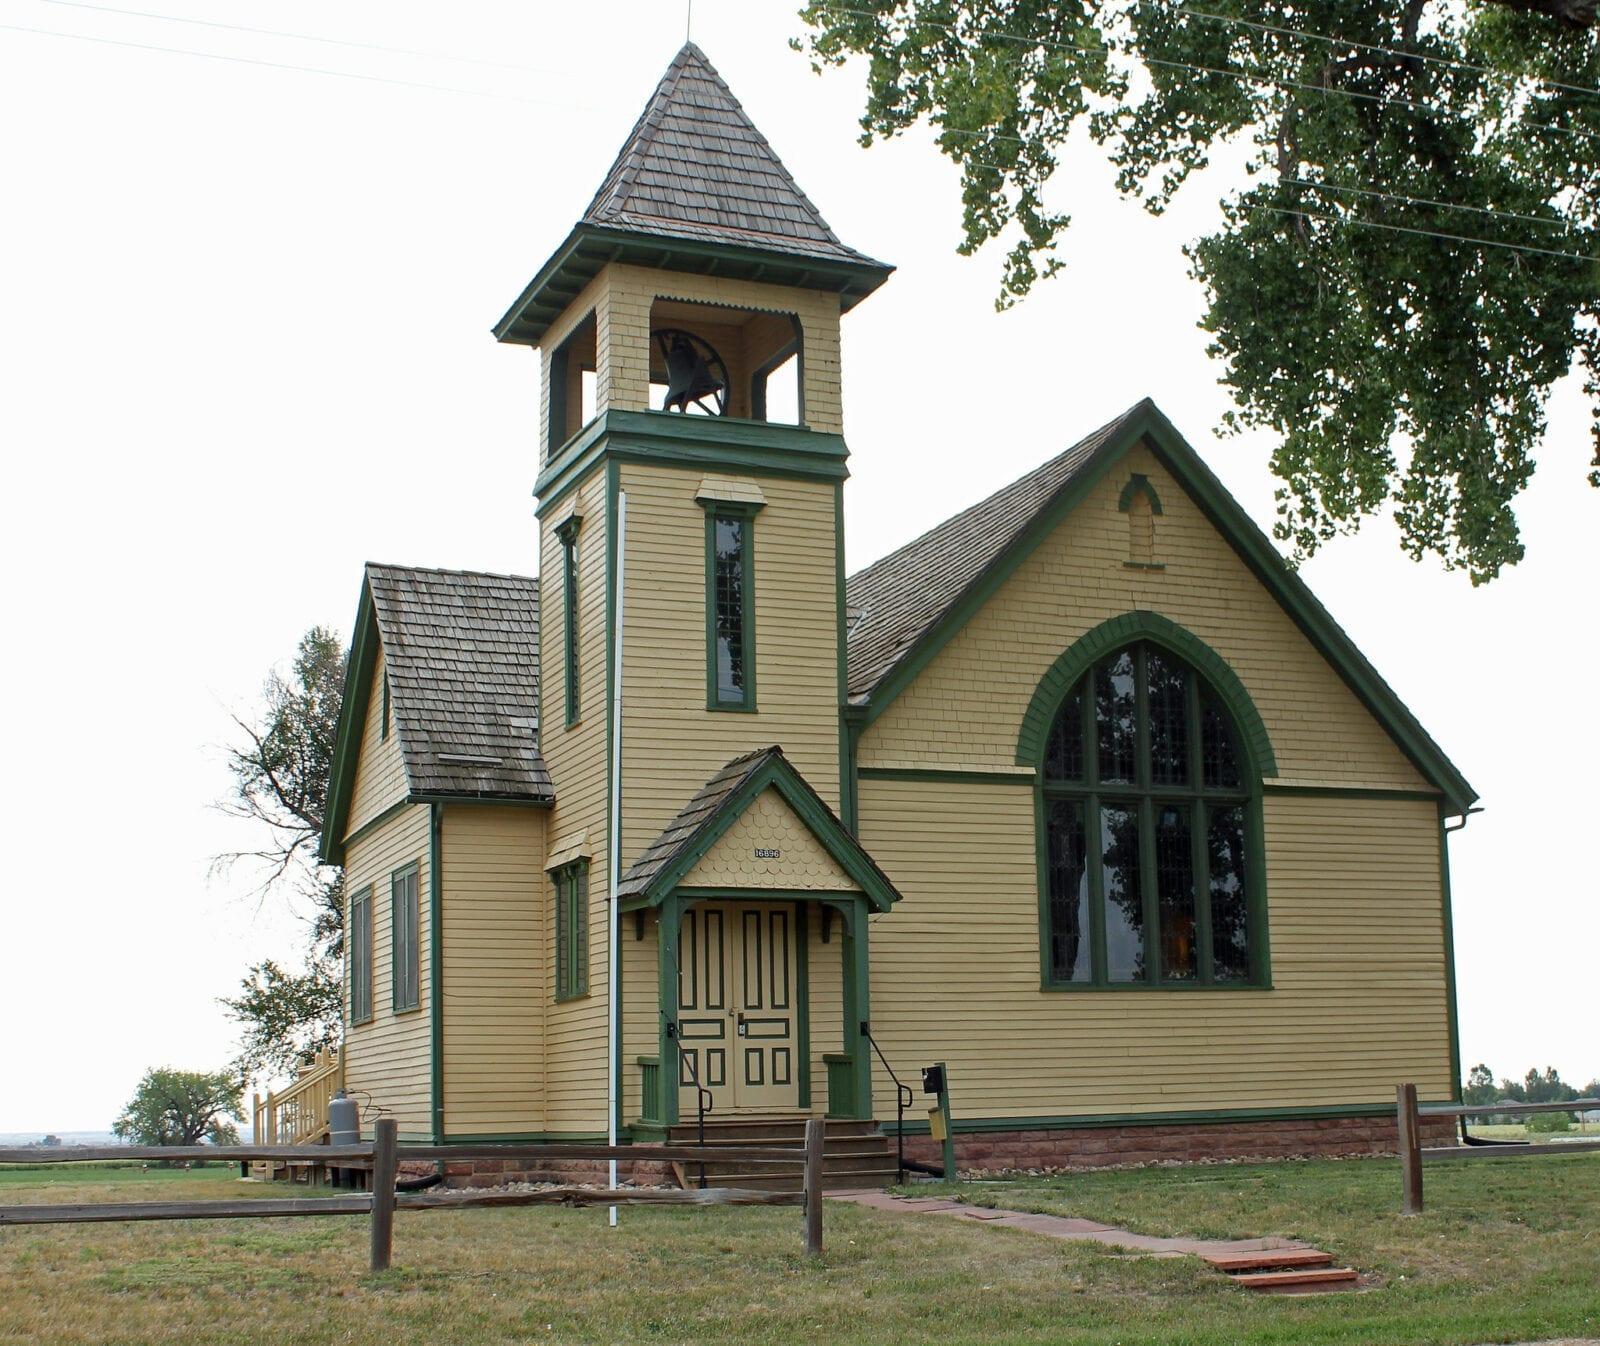 image of the highland lake church